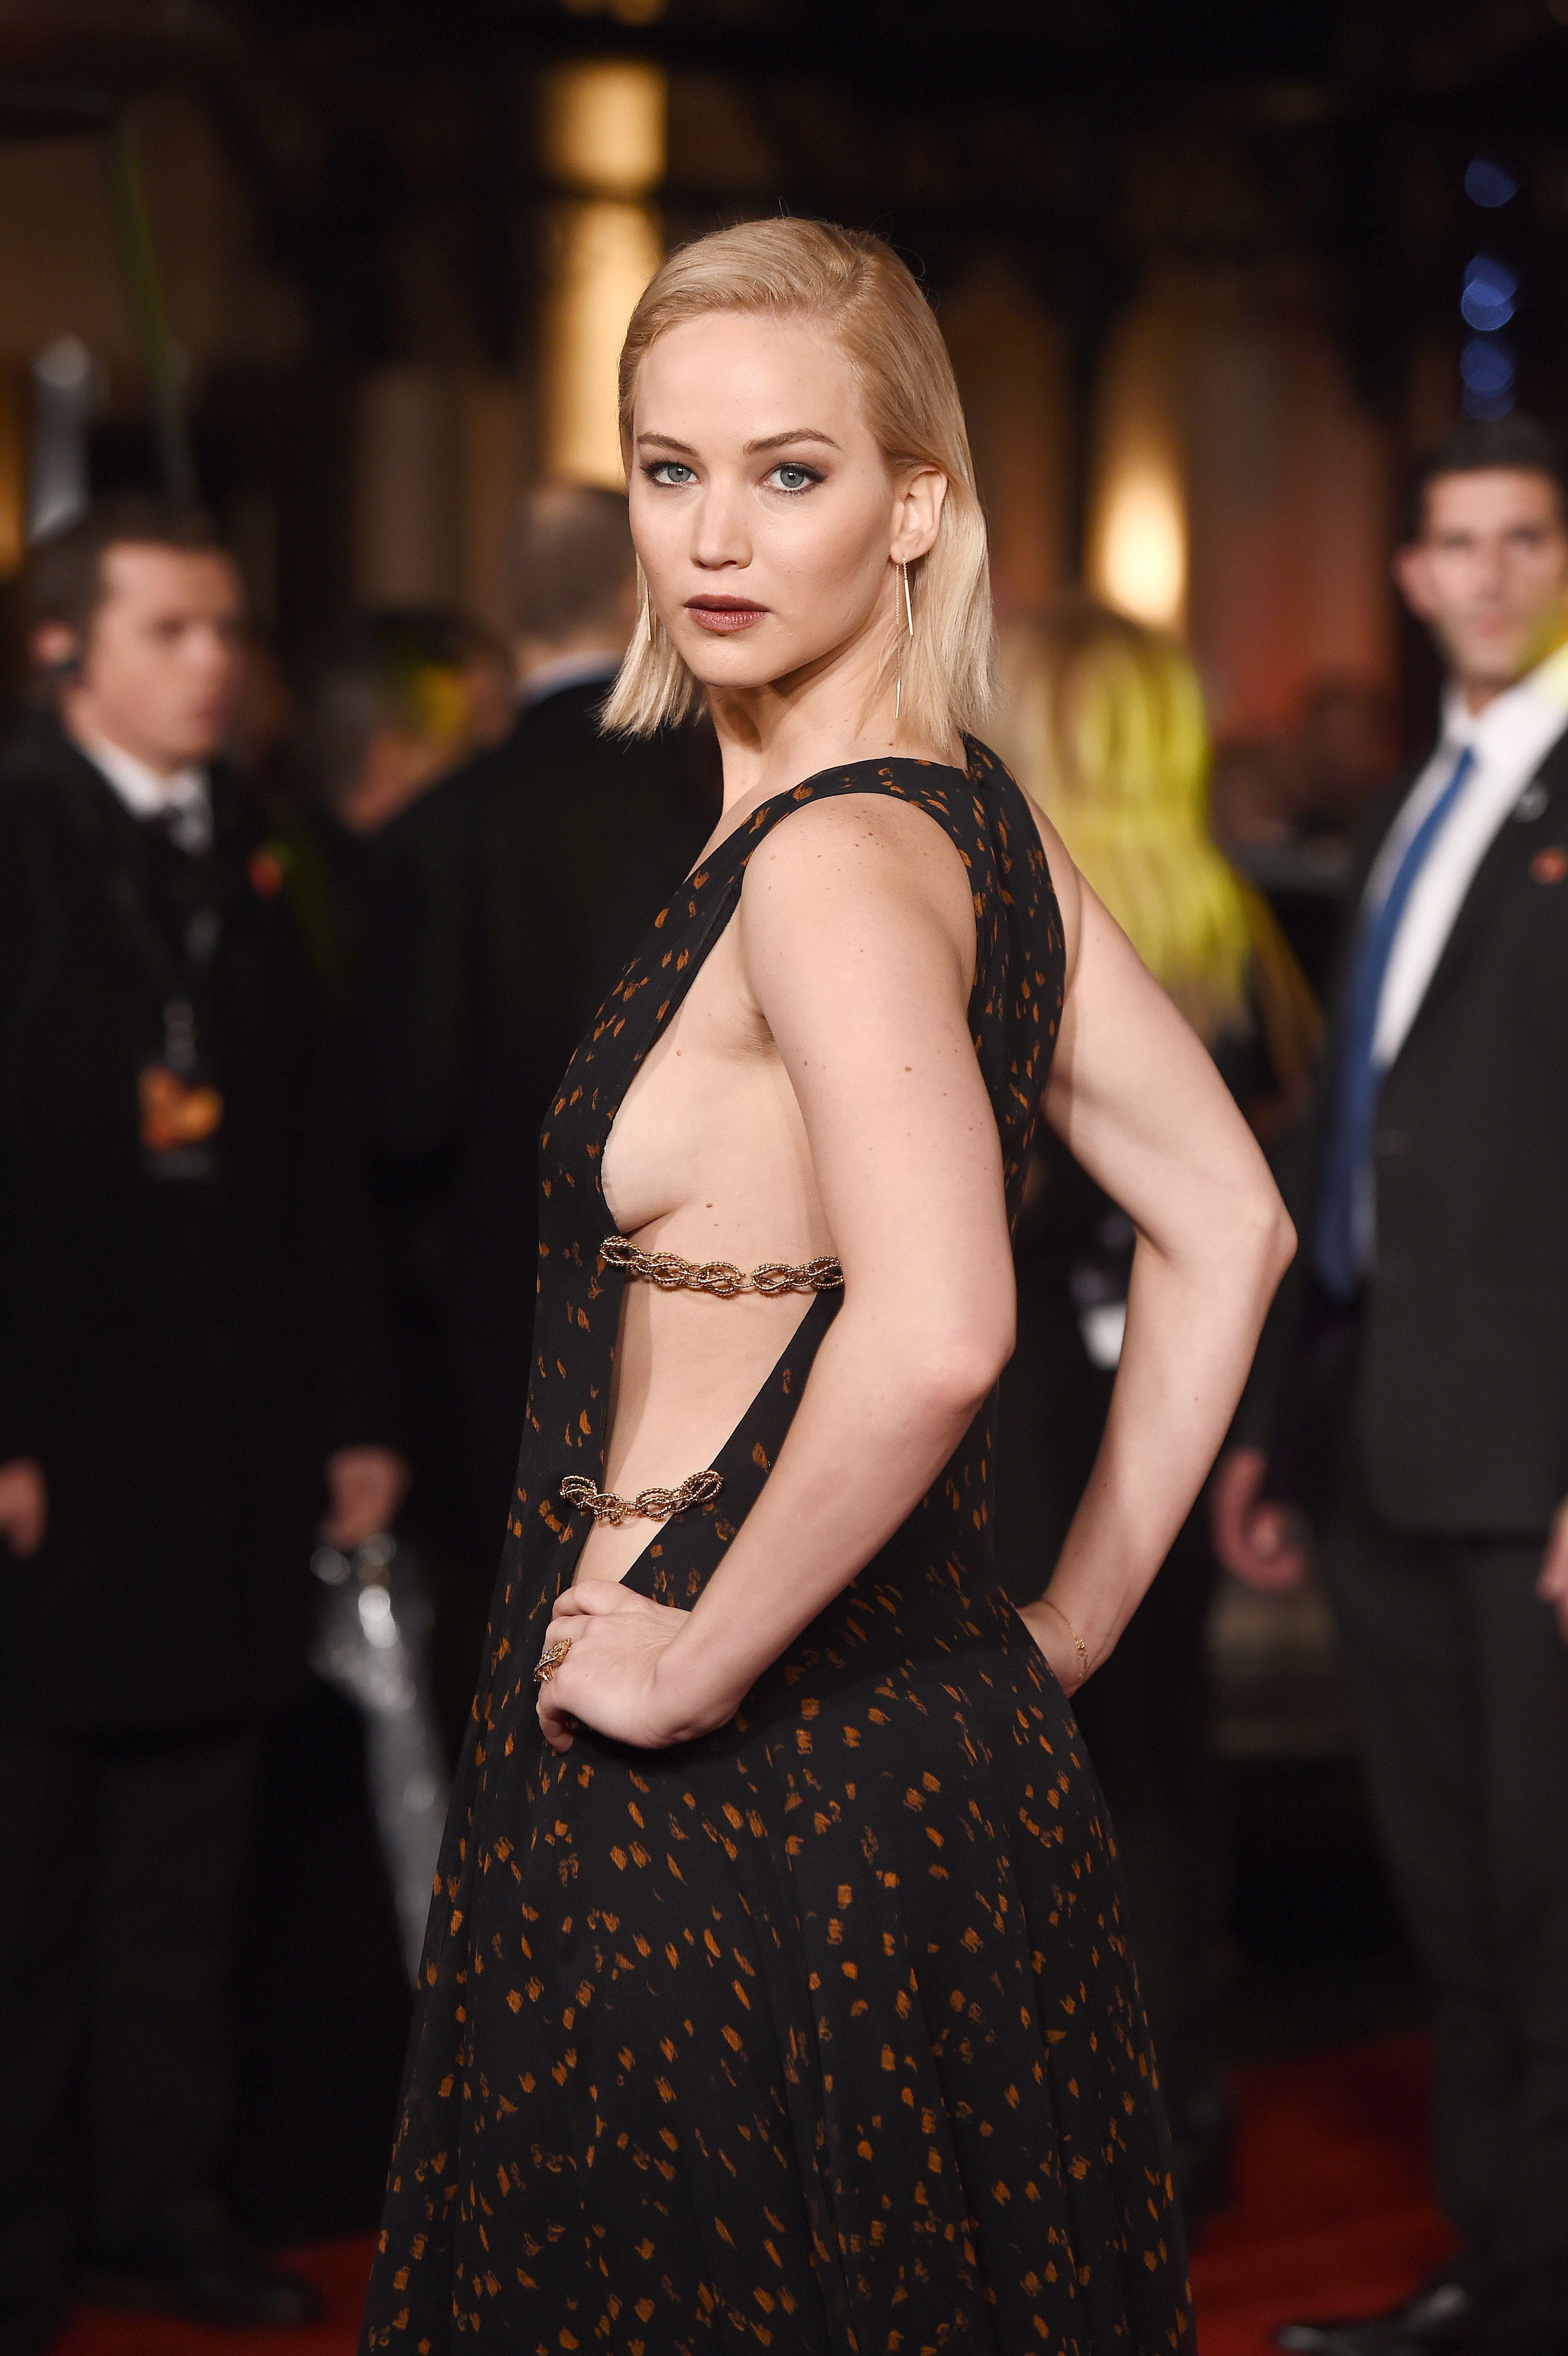 Jennifer Lawrence sideboob (3)